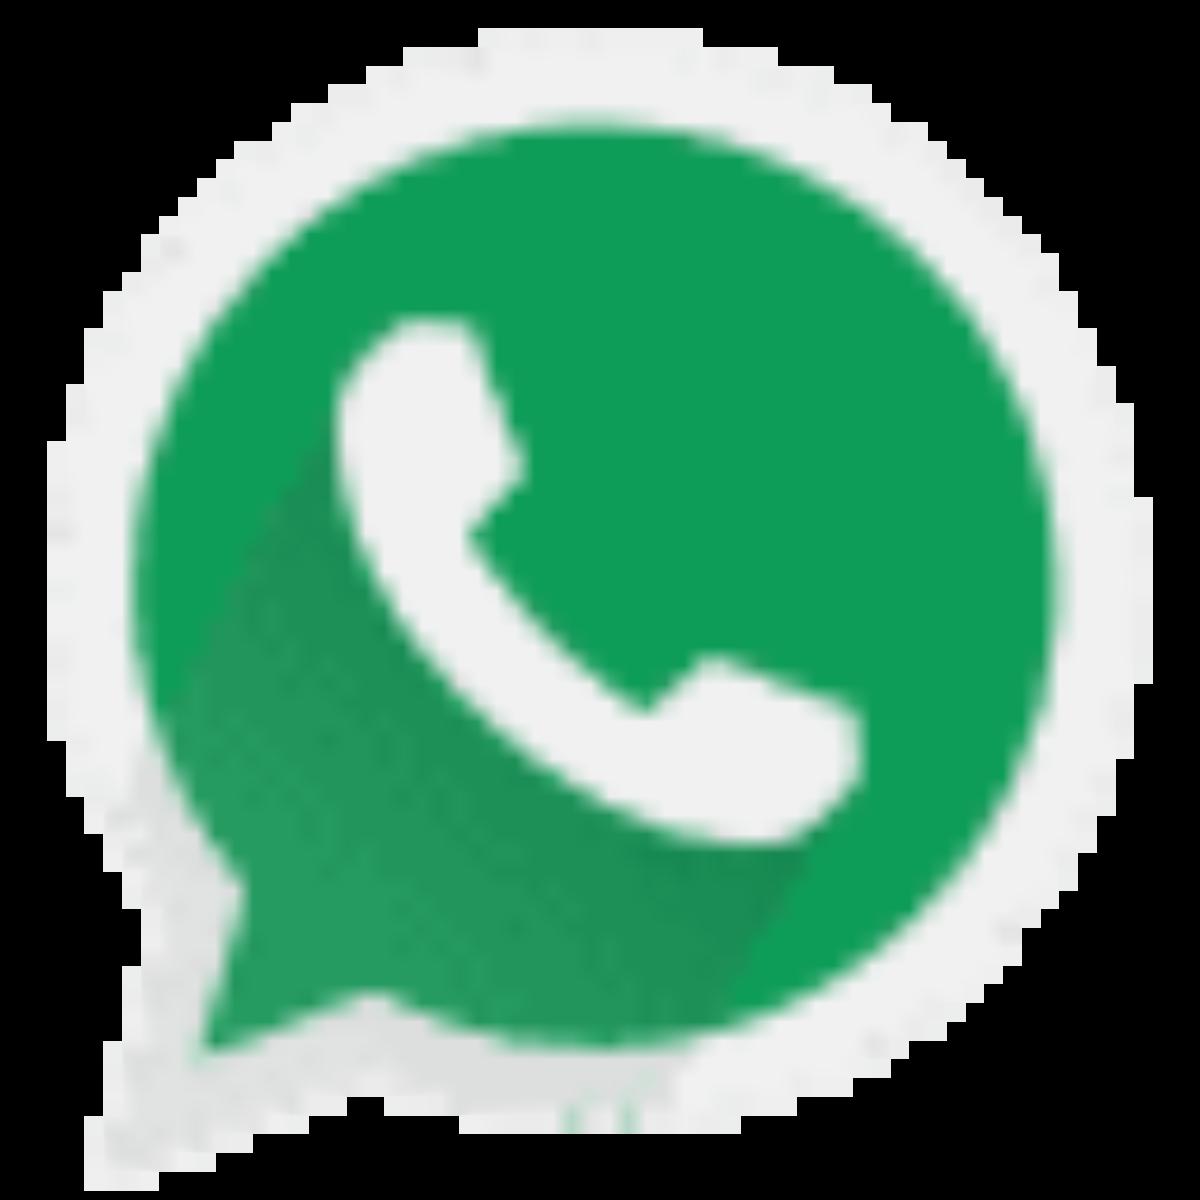 Whatsapp Desktop For Pc Download 2020 Windows 7 10 8 32 64 Bit